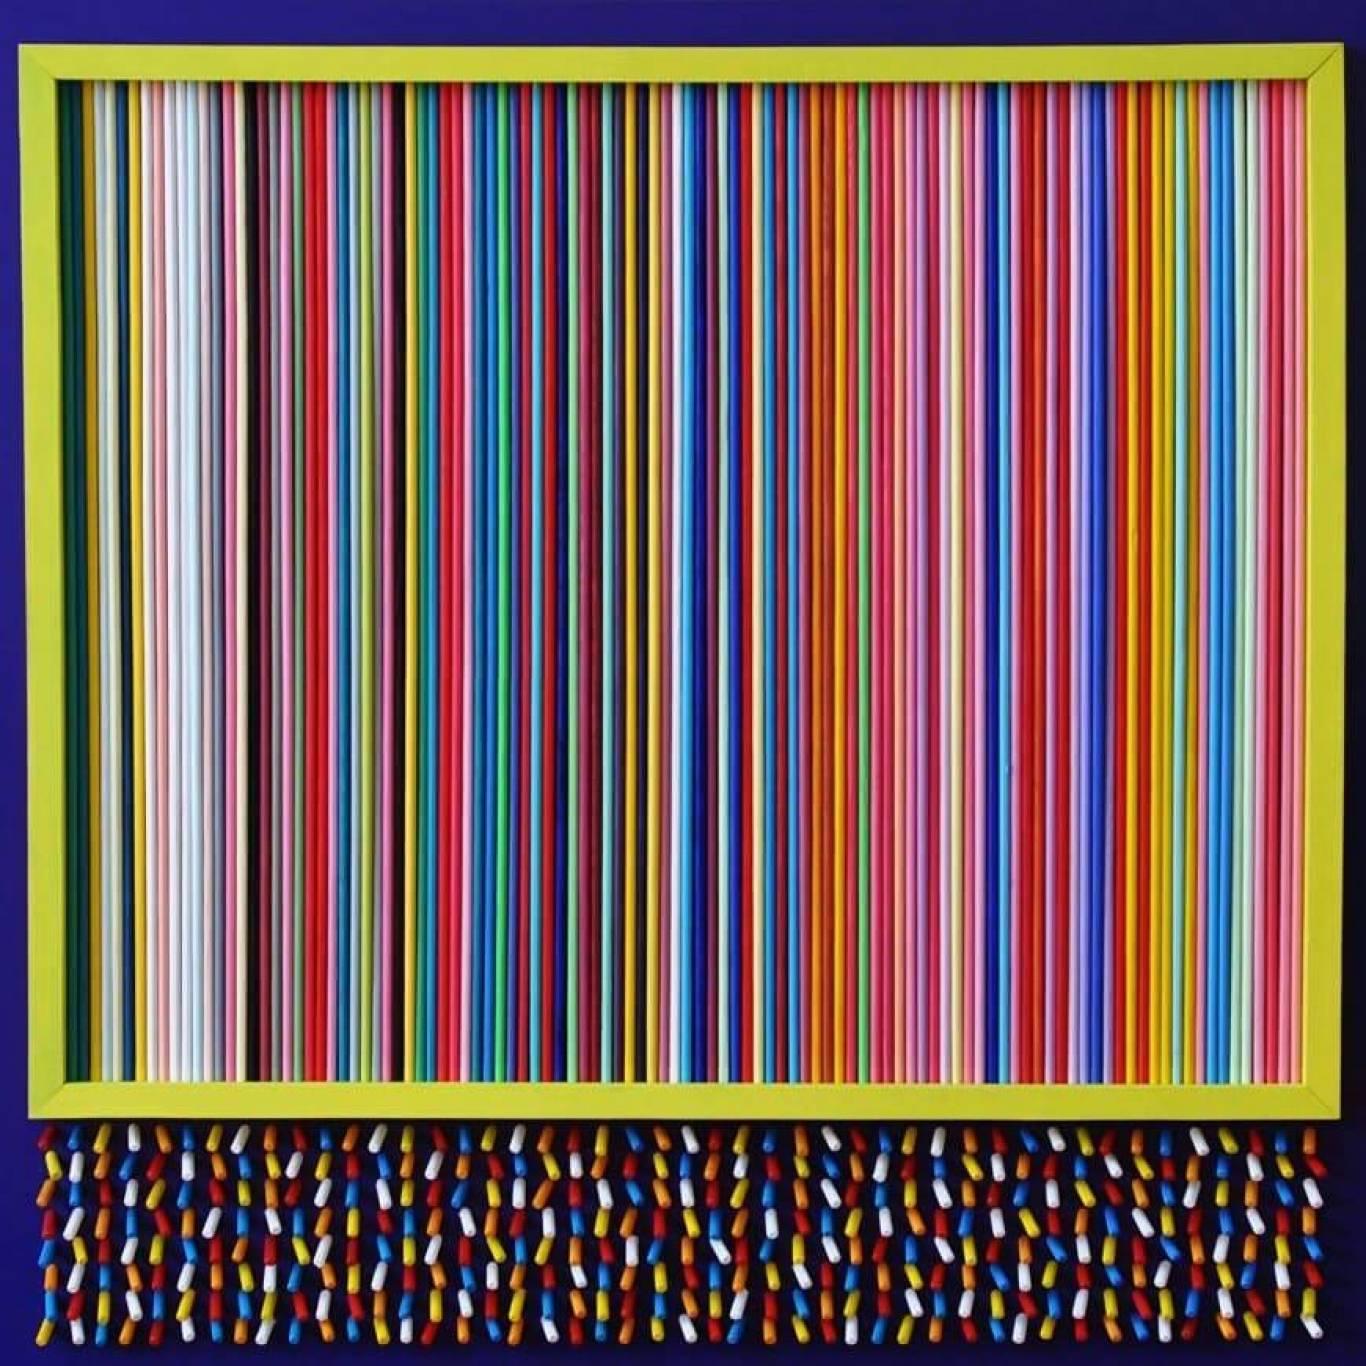 ДЕ:ФОРМА - виставка абстрактної пластики